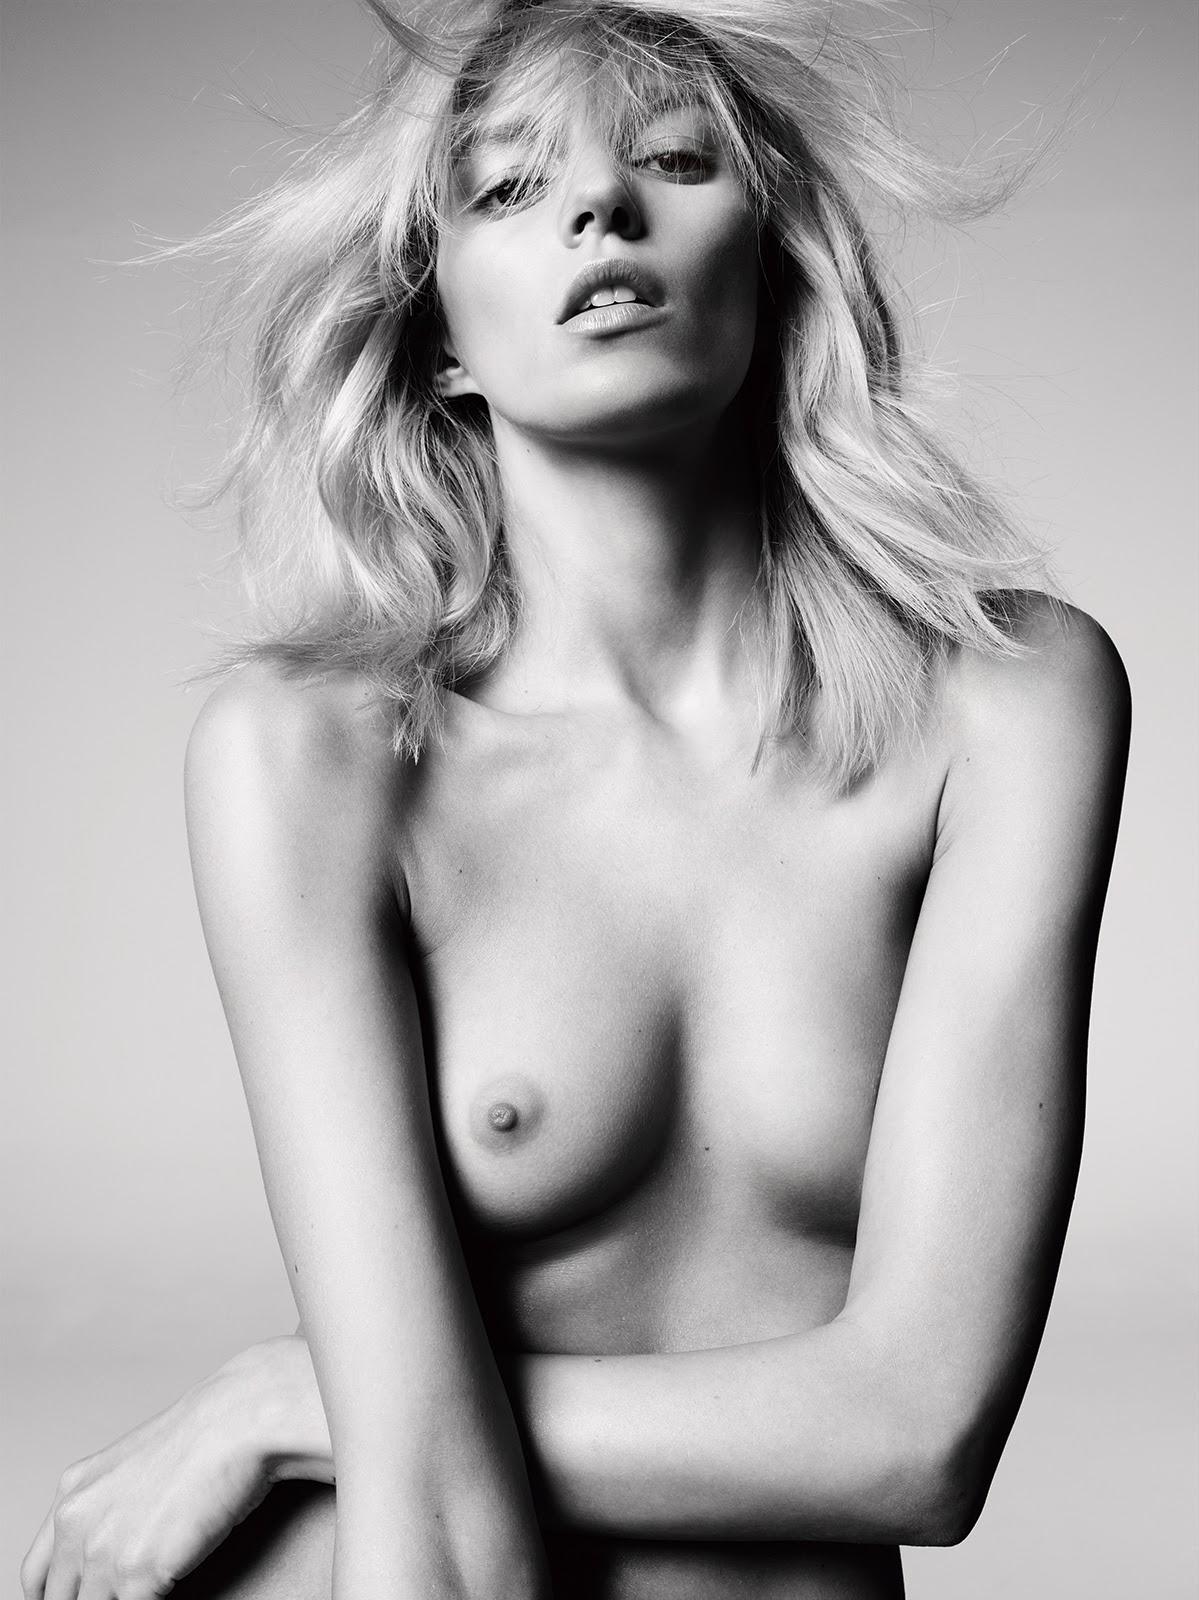 Anja Rubik breasts